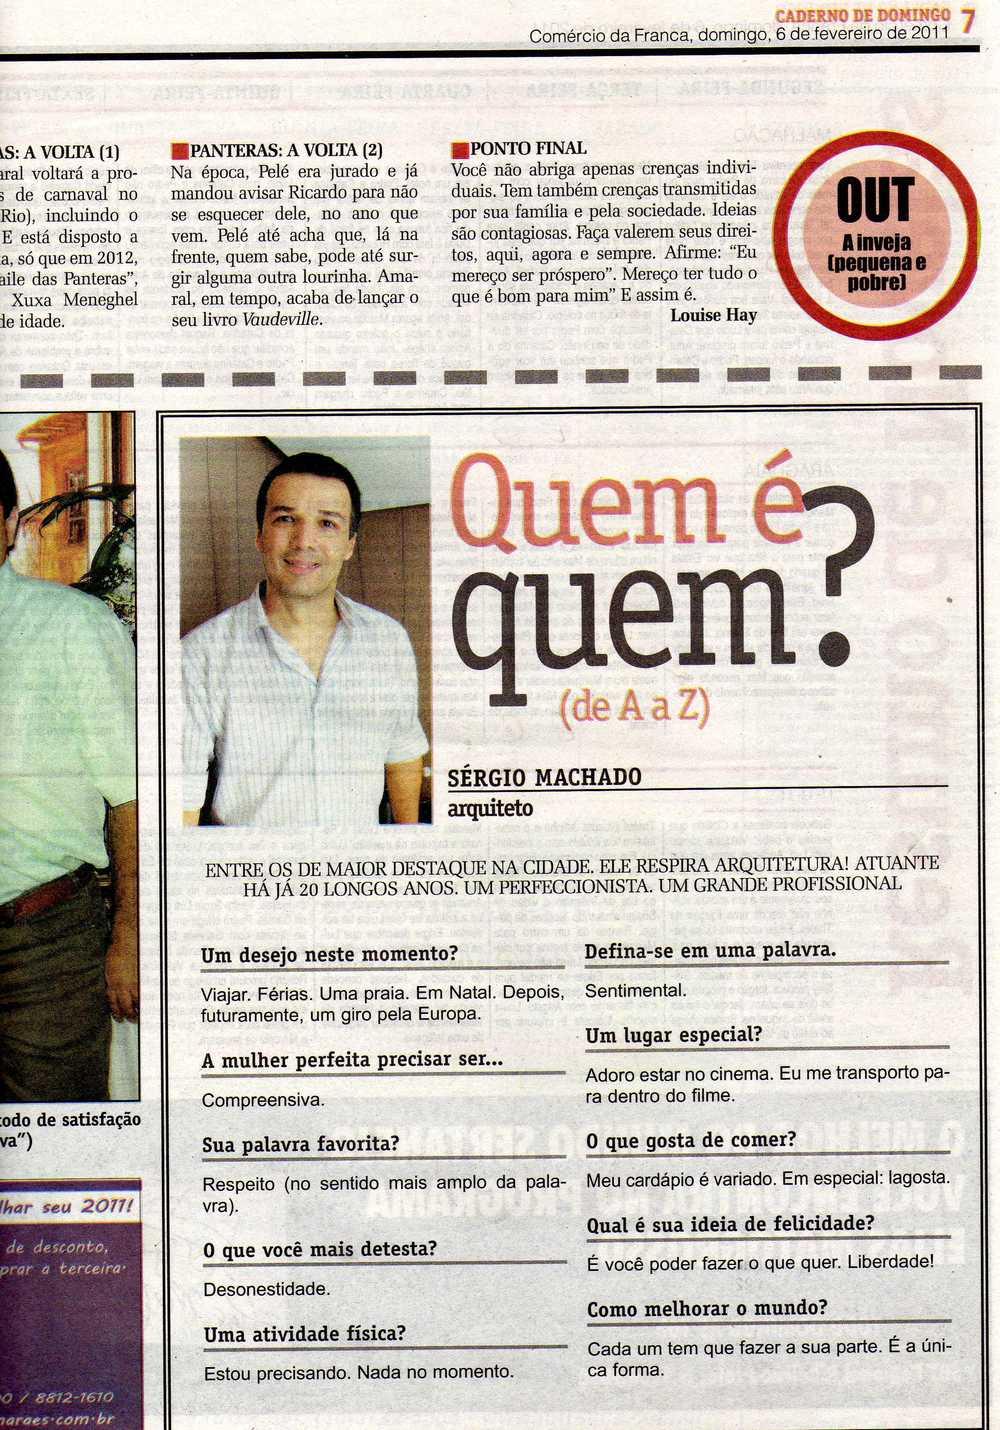 Entrevista Jornal Comércio da Franca - Caderno de Domingo - fev 2011.jpg